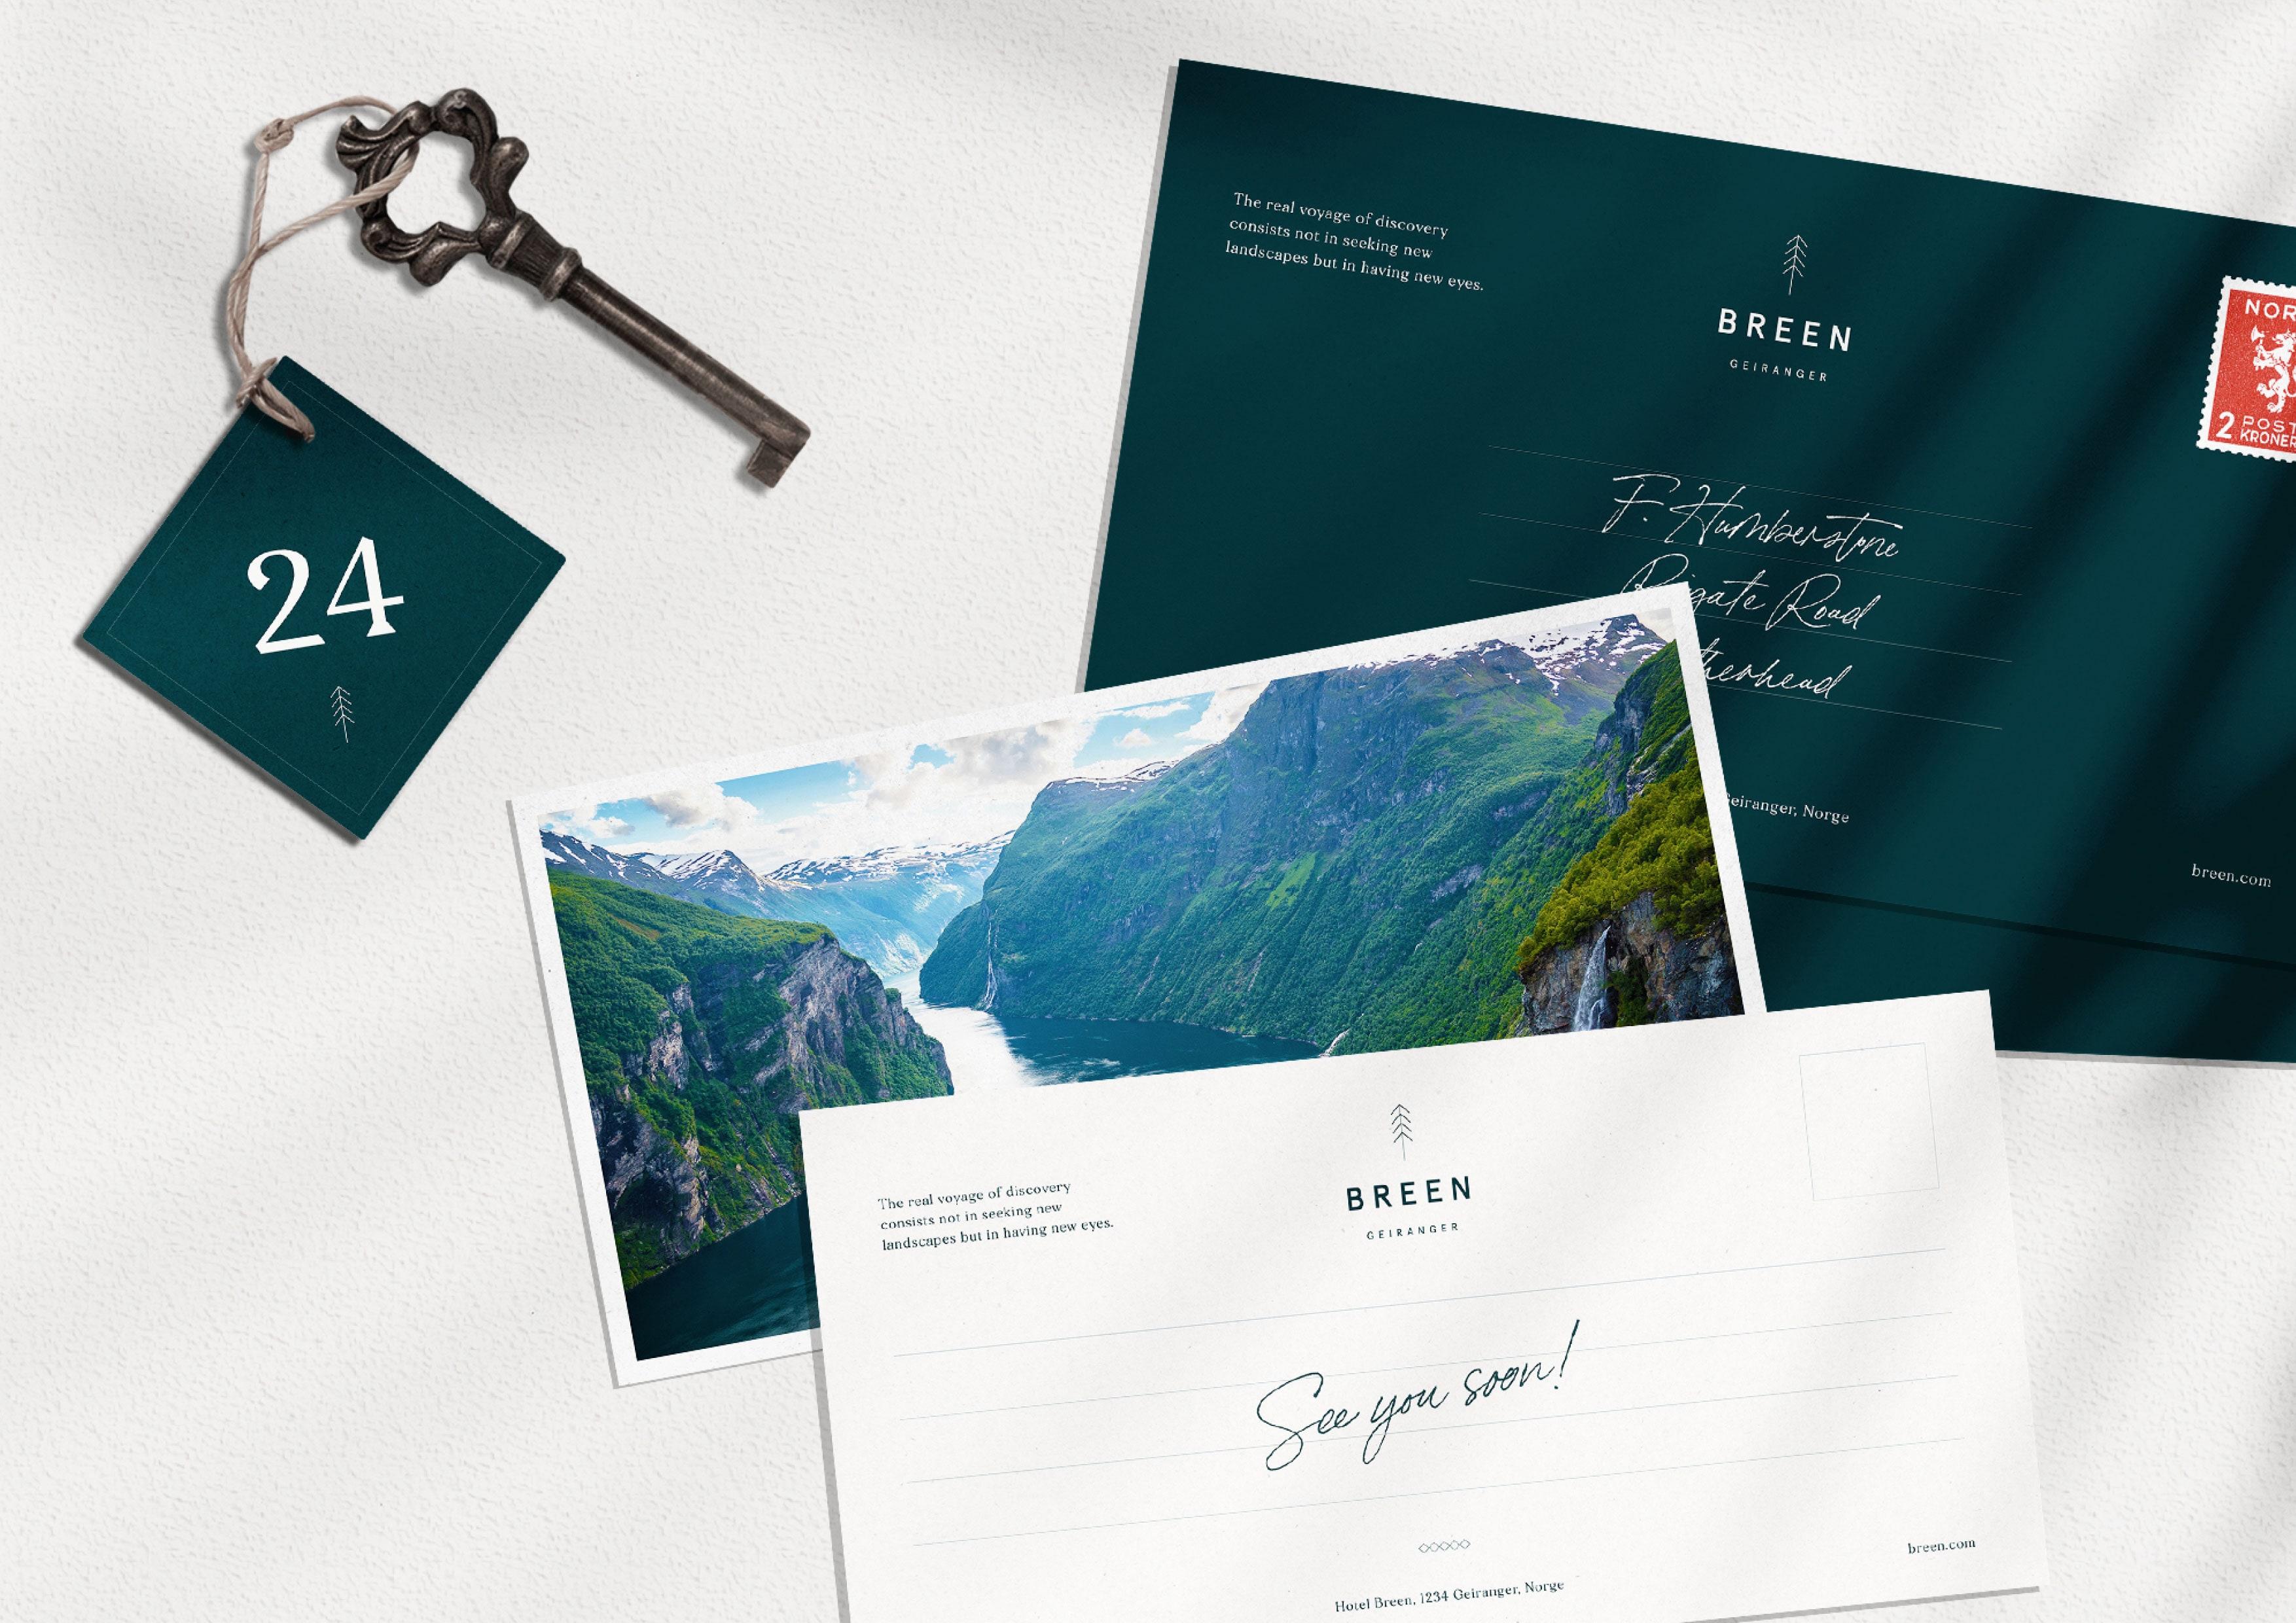 Postcard and envelope design by Jack Watkins for Geirangerfjord hotel, BREEN